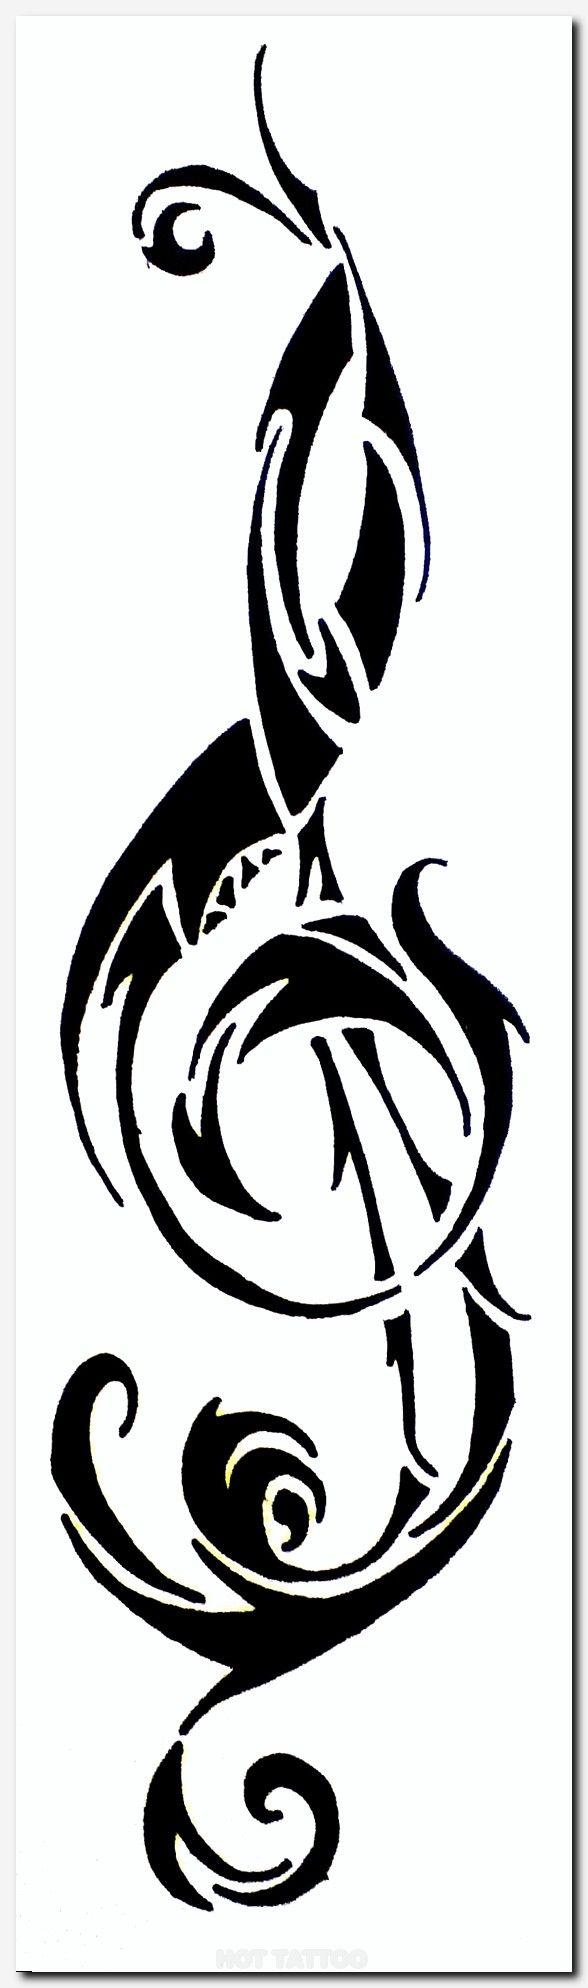 #tribaltattoo #tattoo ladies chest tattoo ideas, tribal tattoos for upper arm, best tattoo shops in london, m tattoo designs, angel tattoo simple, double heart tattoo images, tattoo girl black and white, hand and forearm tattoos, tattoo shops vancouver, tattoo on rib cage for guys, tattoo thigh, tribal japanese tattoos, floral tattoo sleeve designs, koi tattoo designs for men, fake tattoo designs, earth snake tattoo